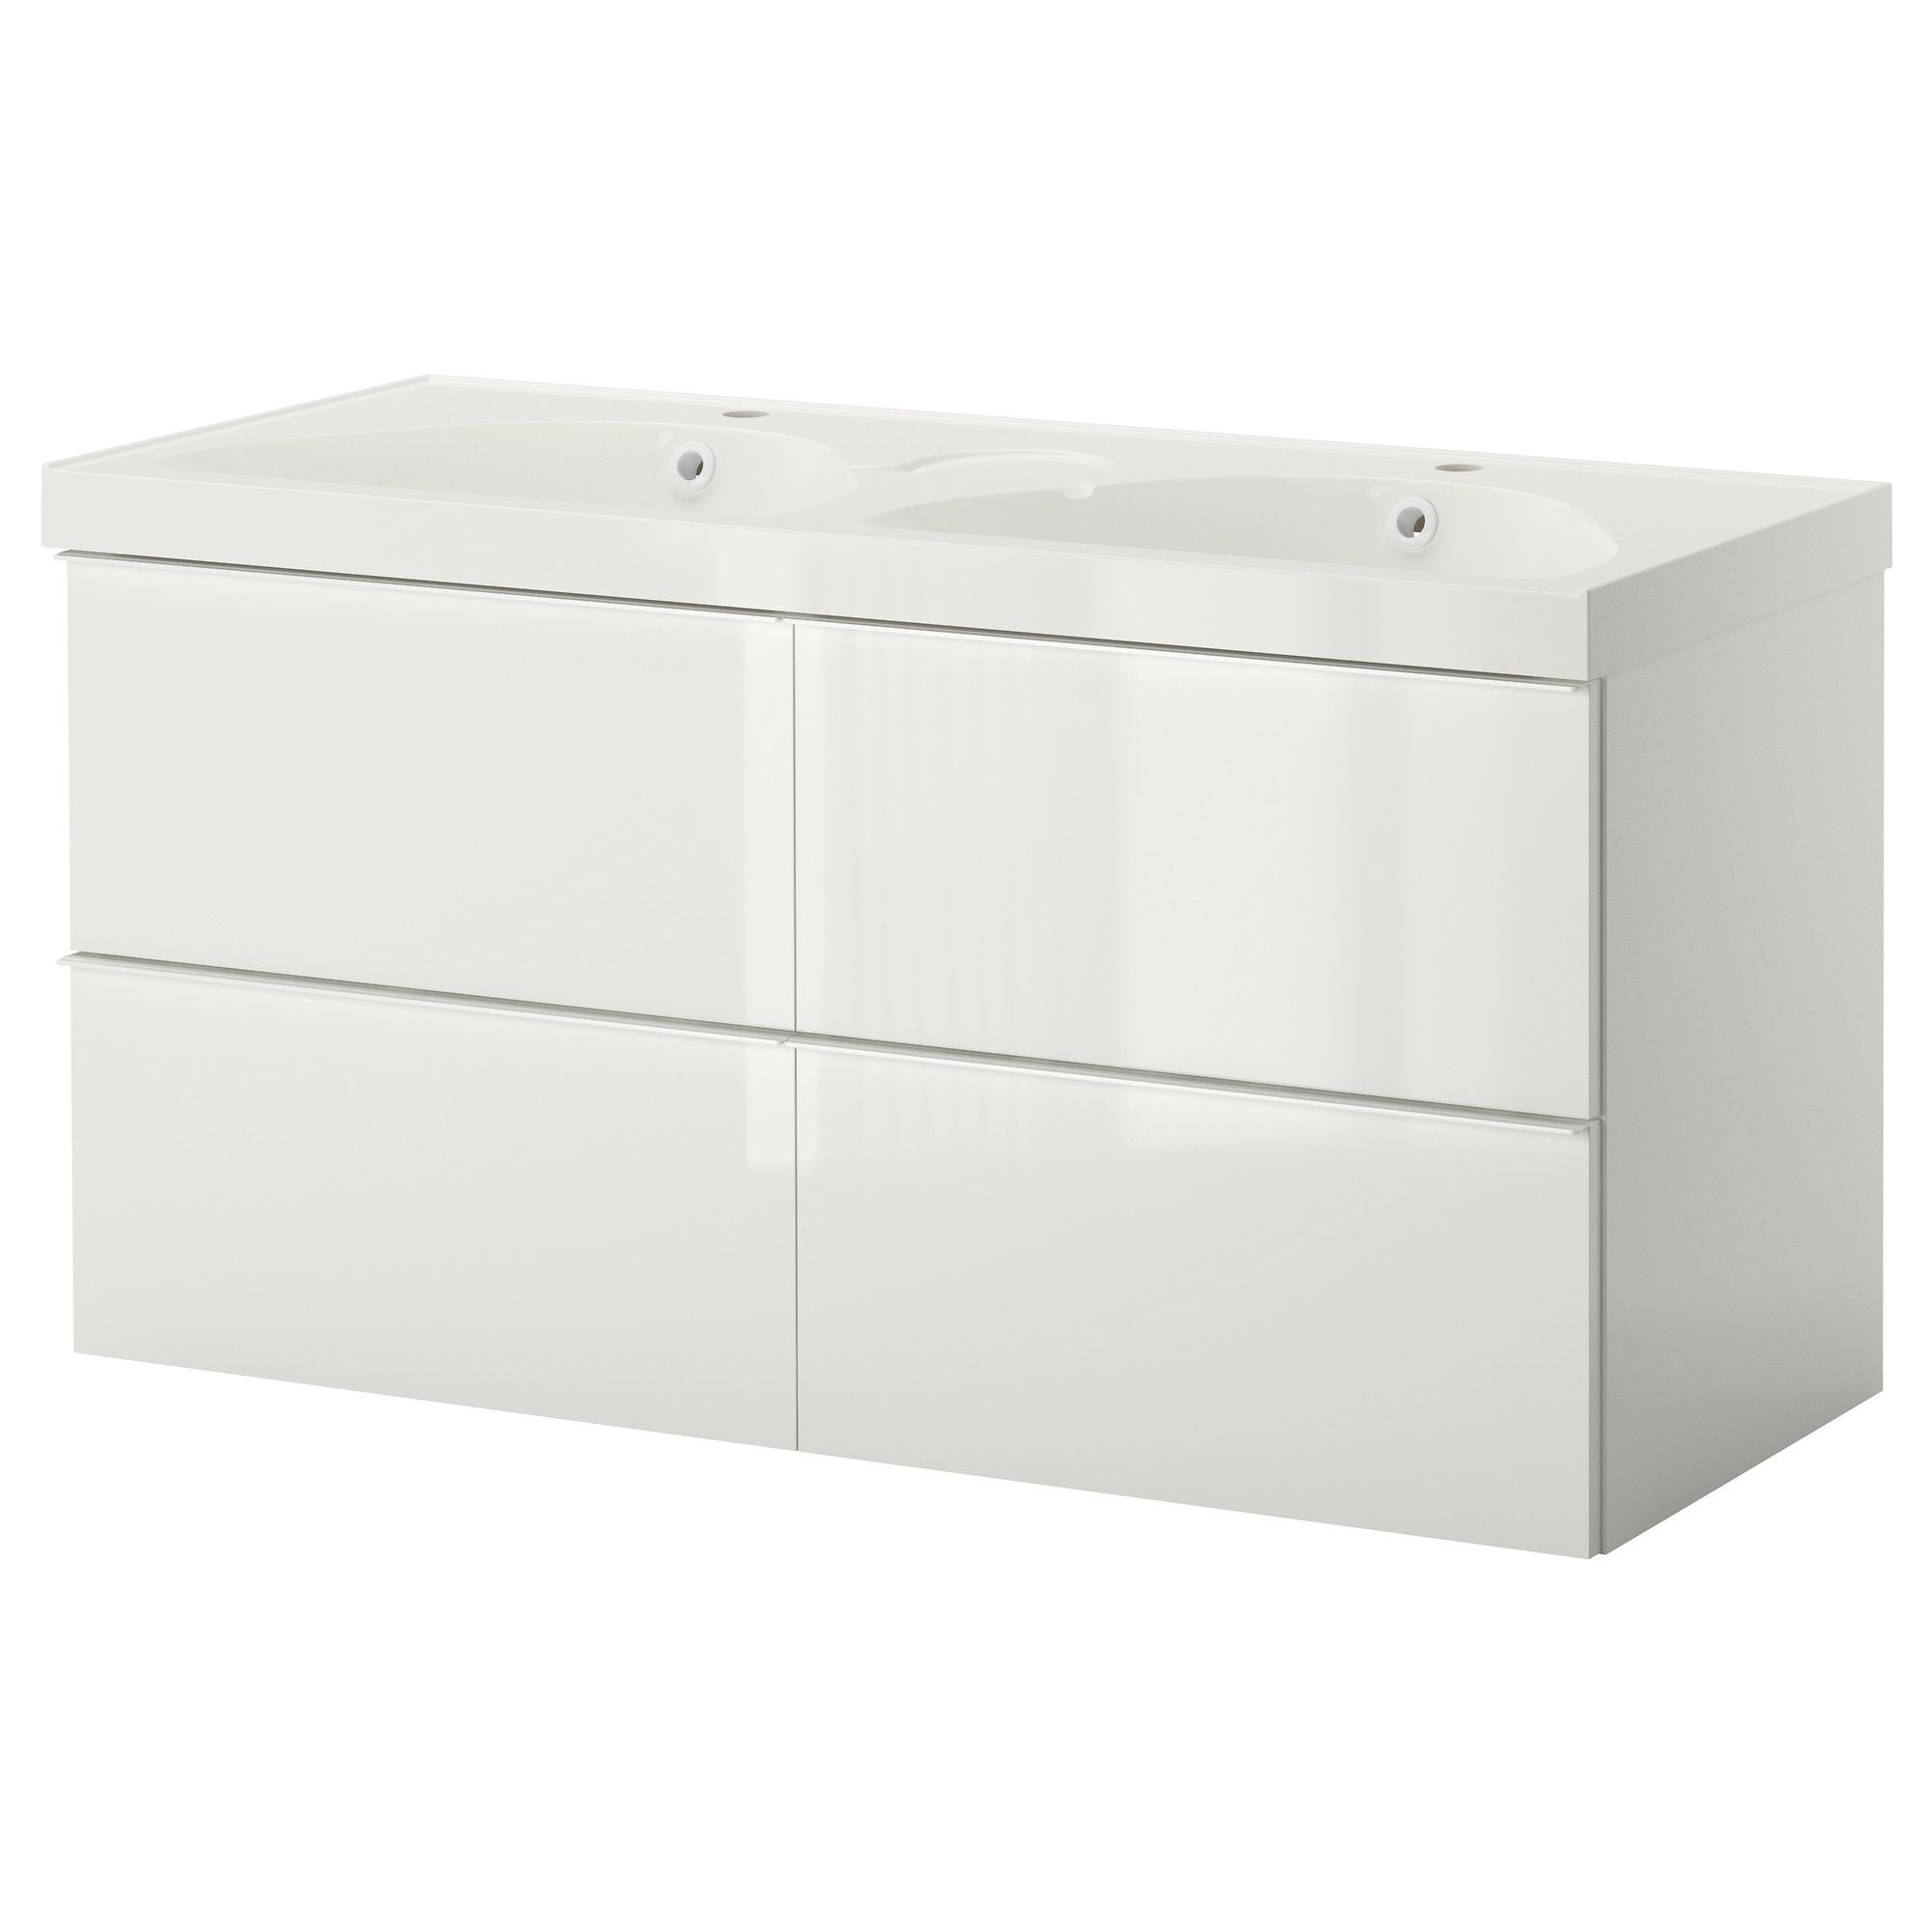 GODMORGON/EDEBOVIKEN Sink cabinet with 4 drawers - high gloss white ...